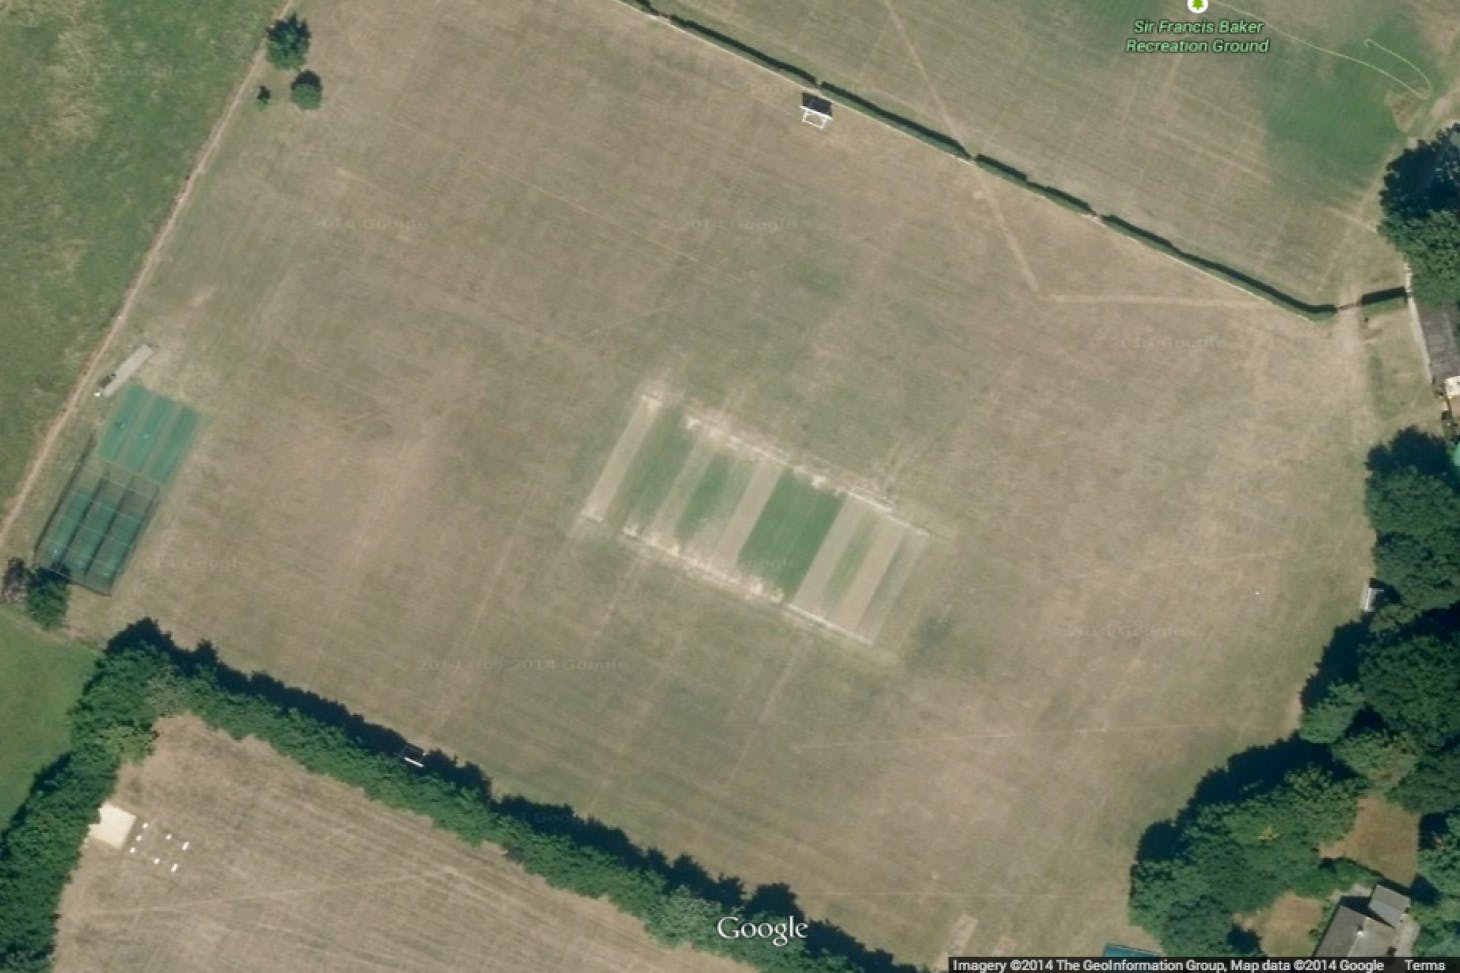 Sir Francis Barker Recreation Ground Full size | Grass cricket facilities